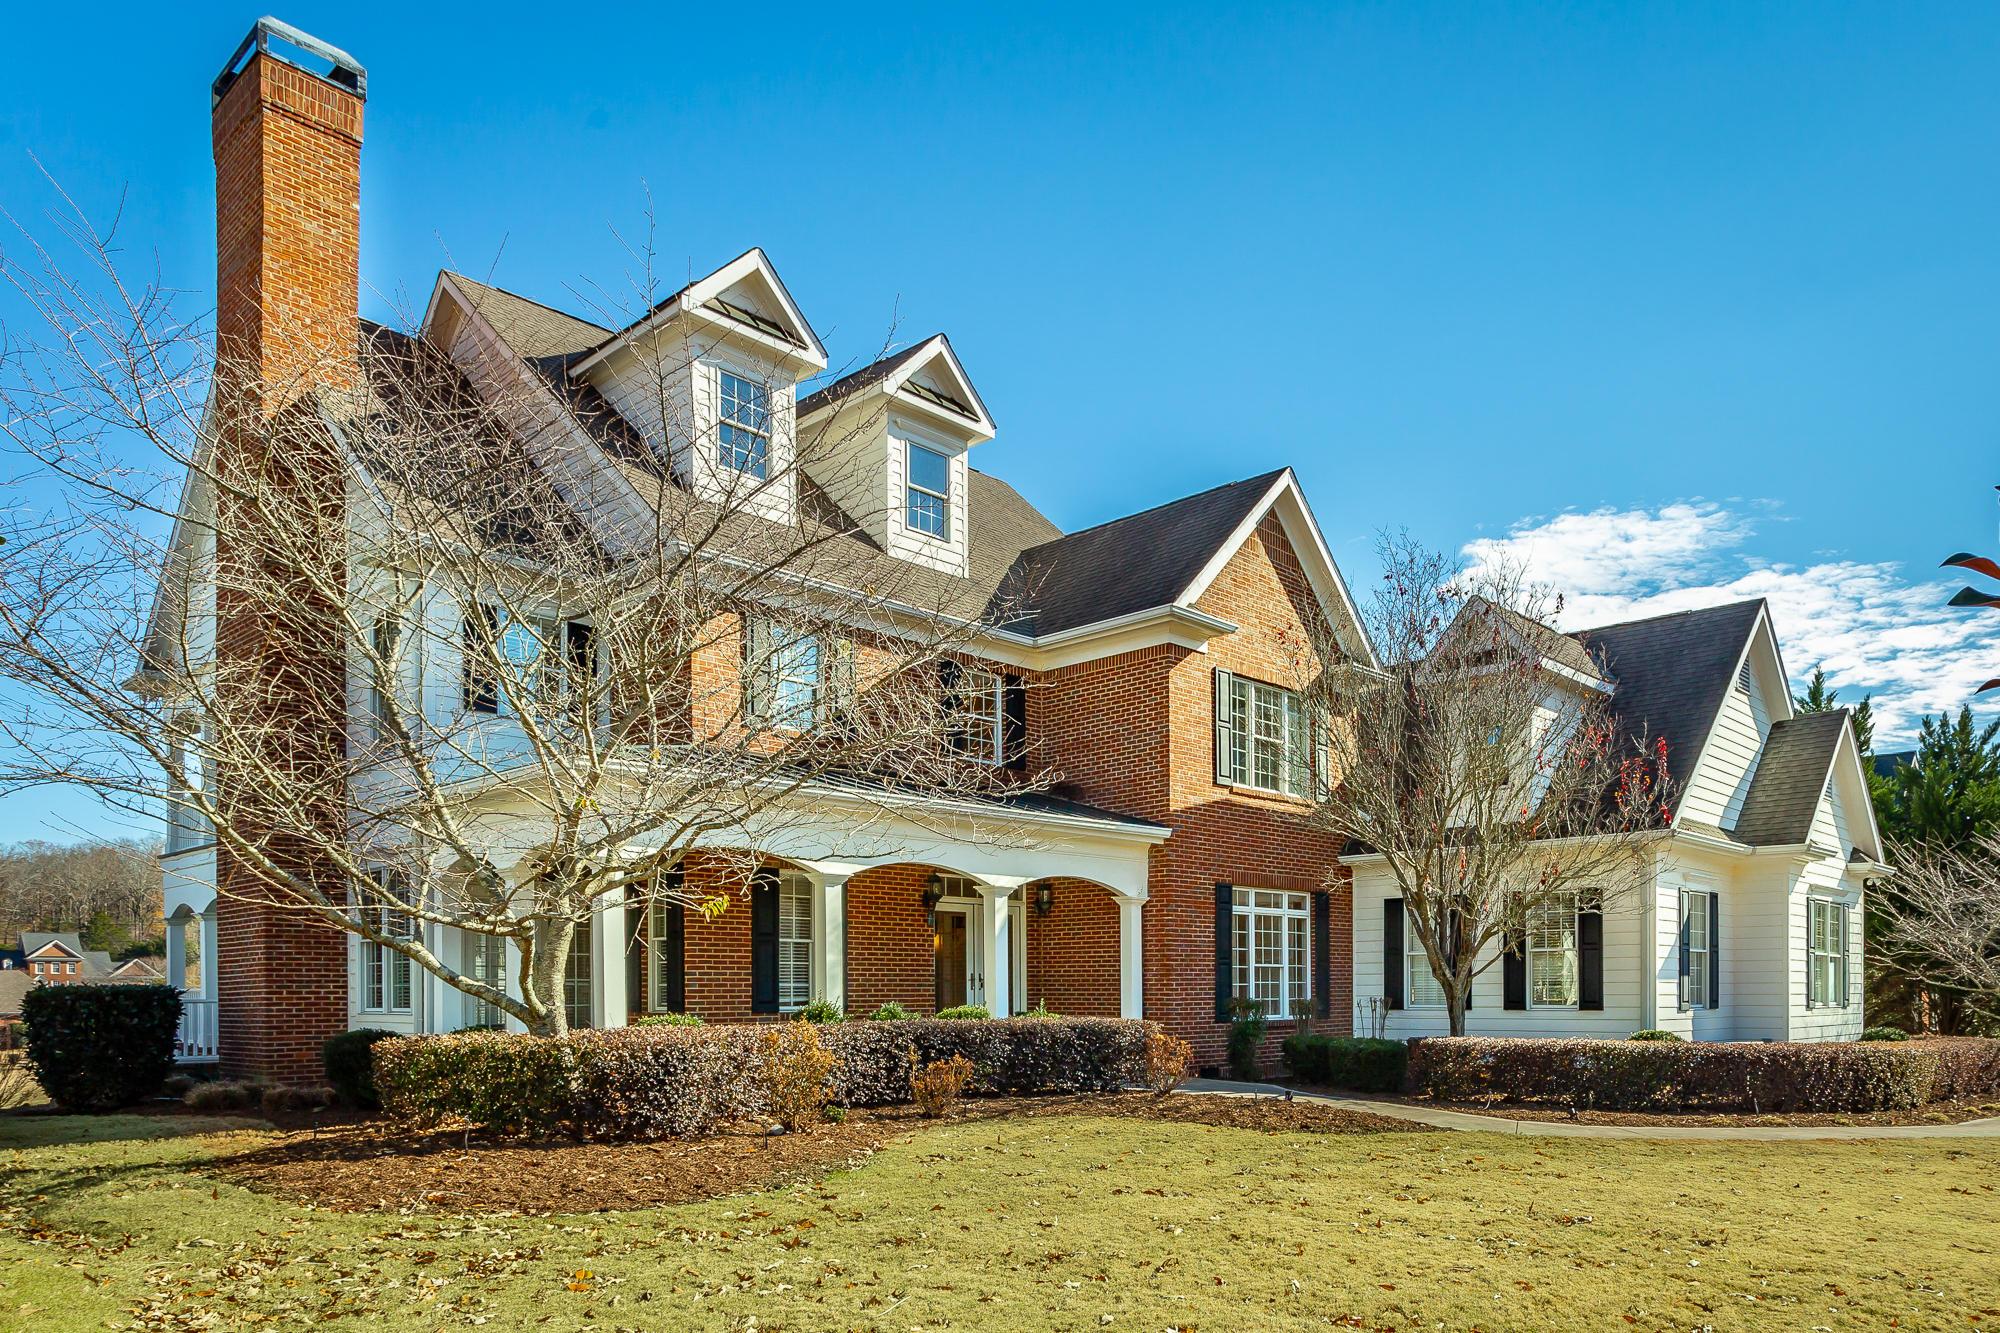 548 Magnolia Vale Dr, Chattanooga, TN 37419